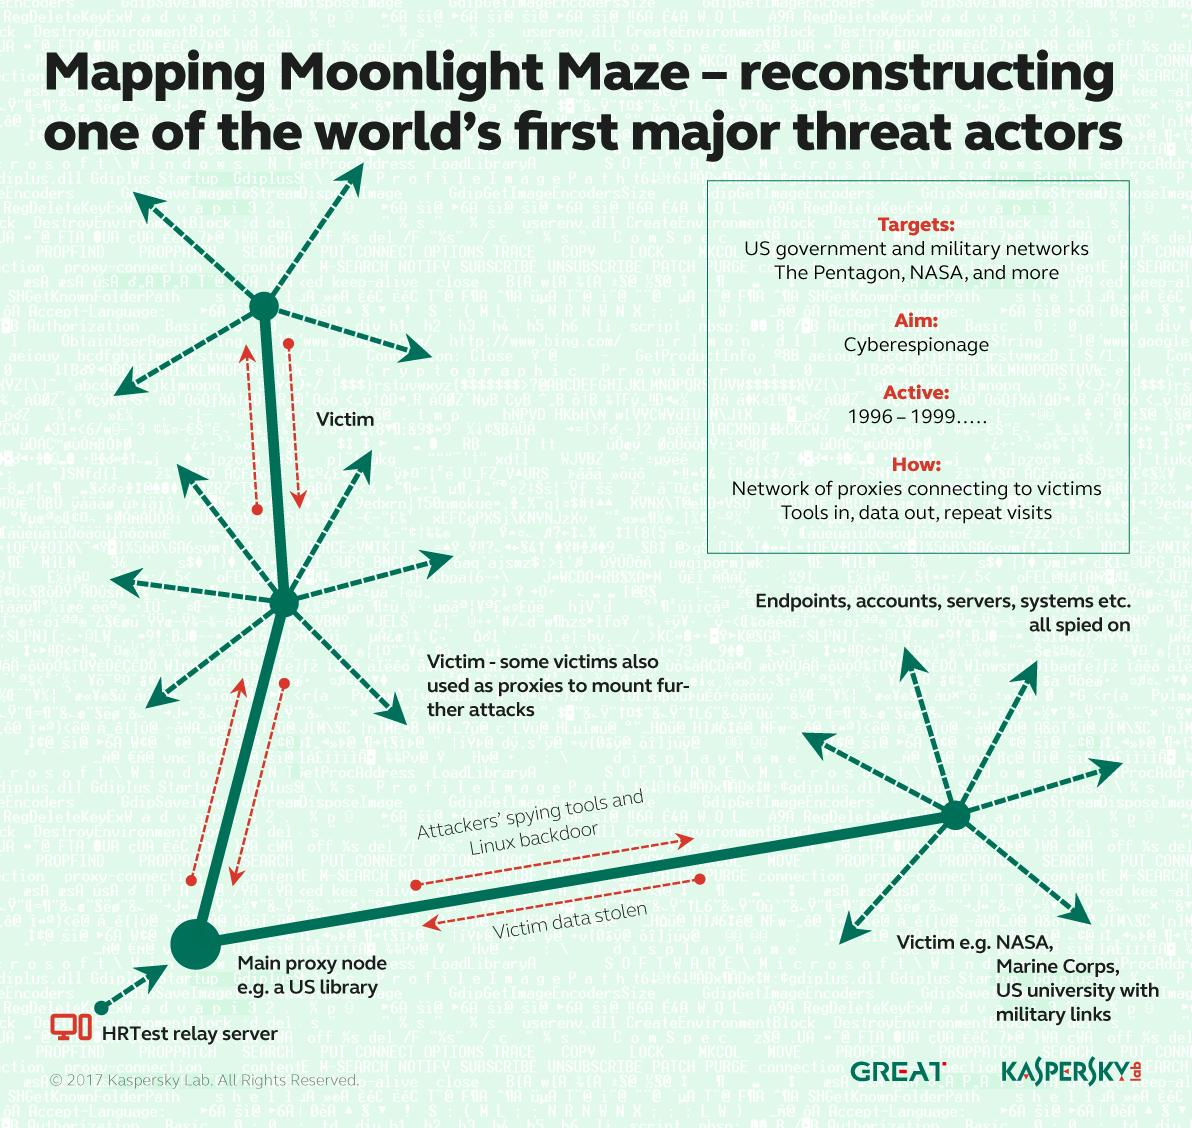 Moonlight Maze